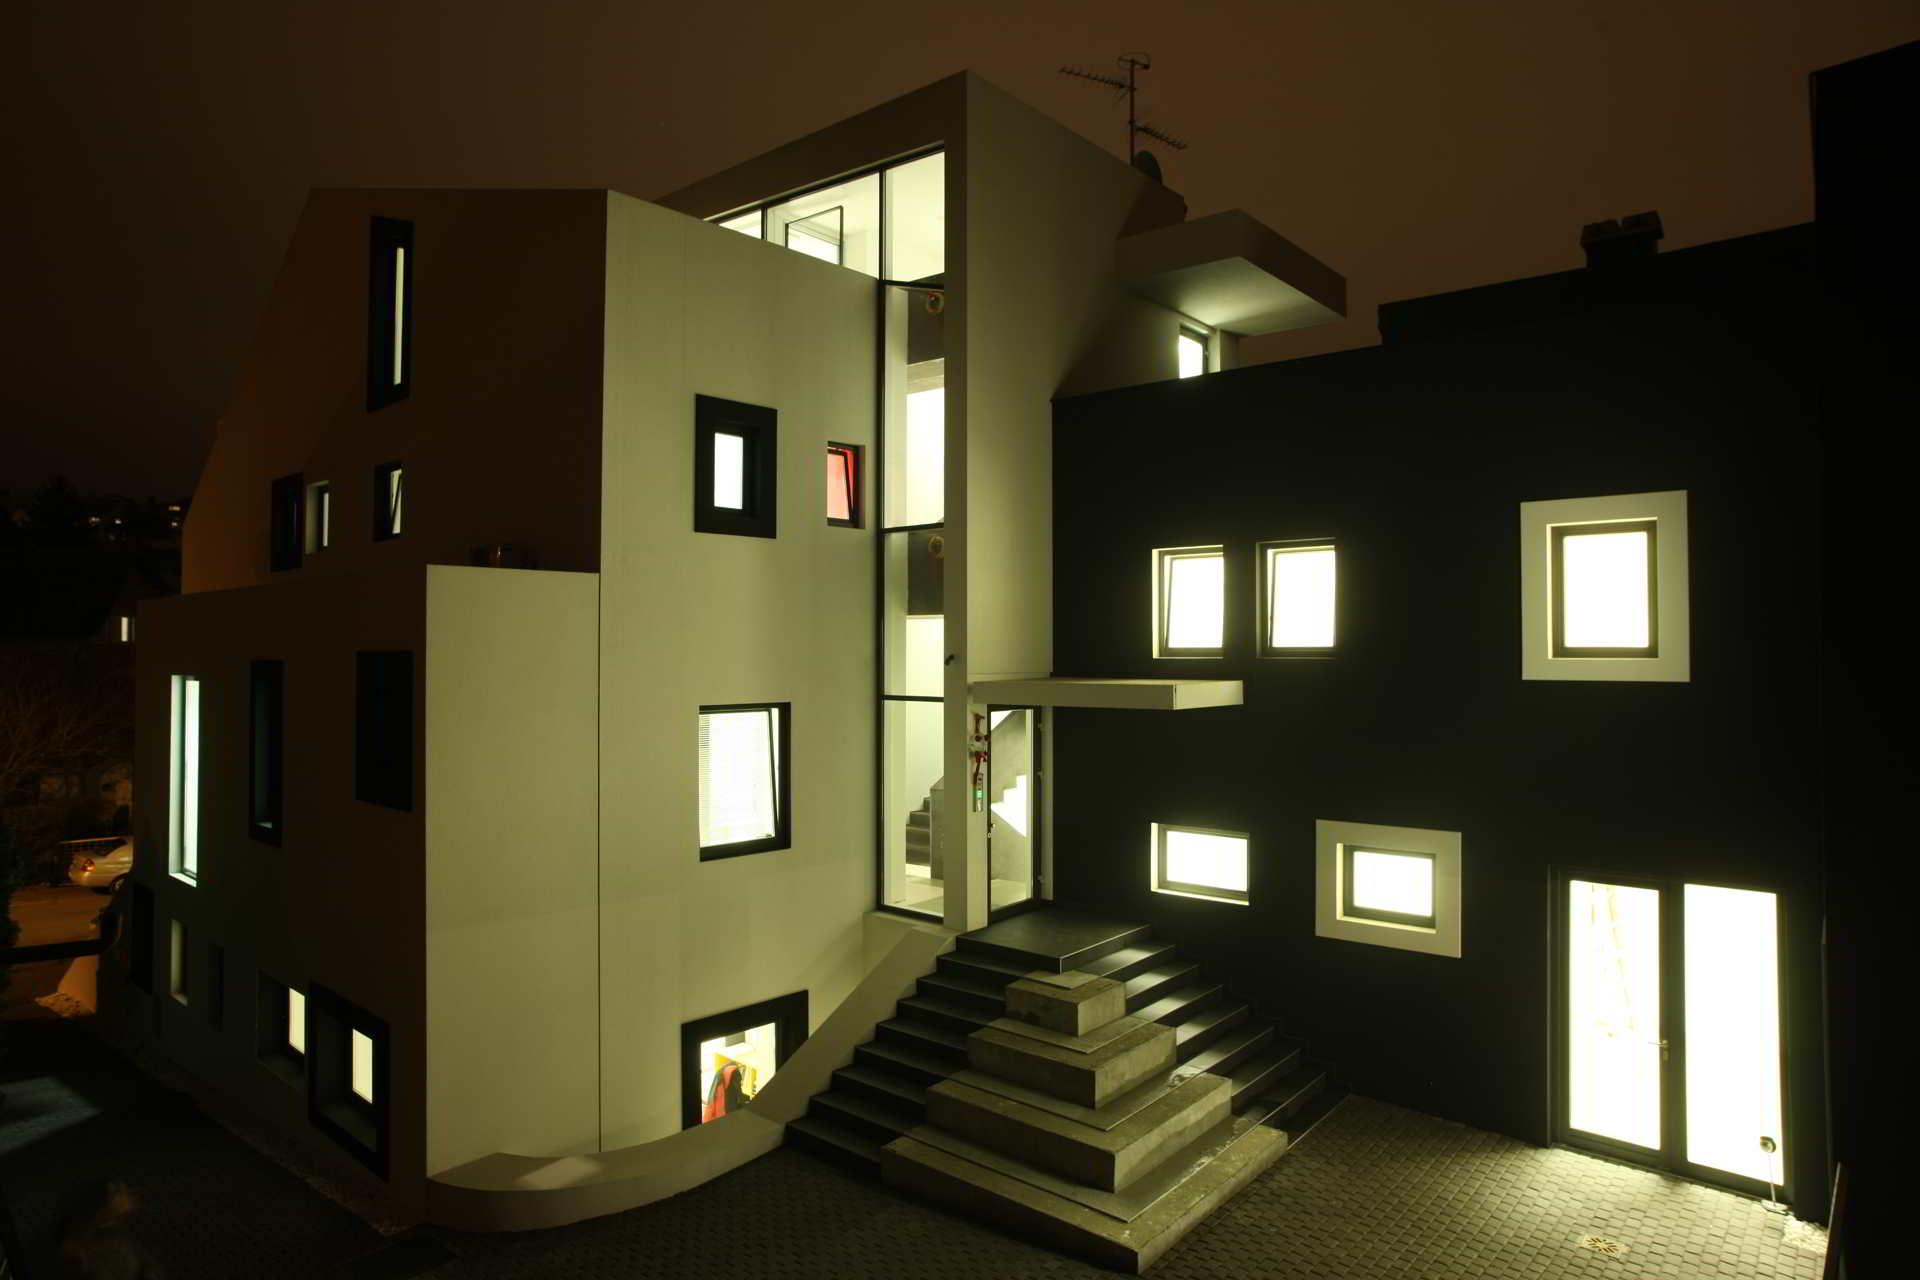 vinogradska, vinogradska 49, UPI-2M, arhitektura, Architecture, office building, poslovni objekt